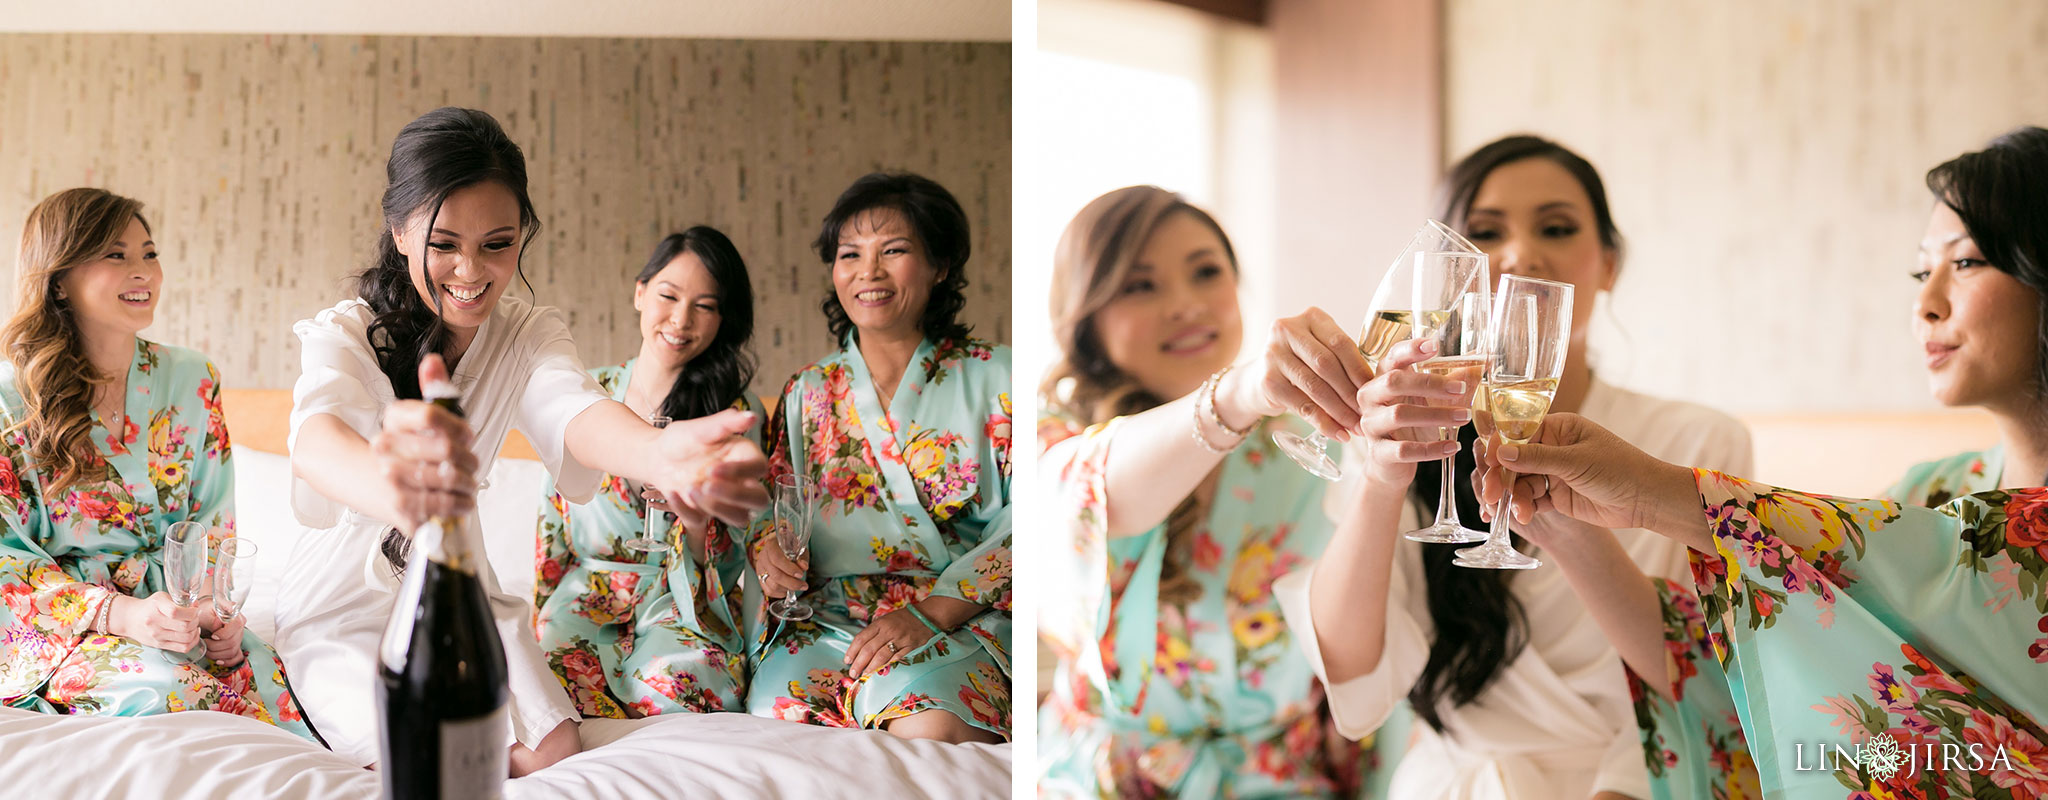 02 richard nixon library bride wedding photography